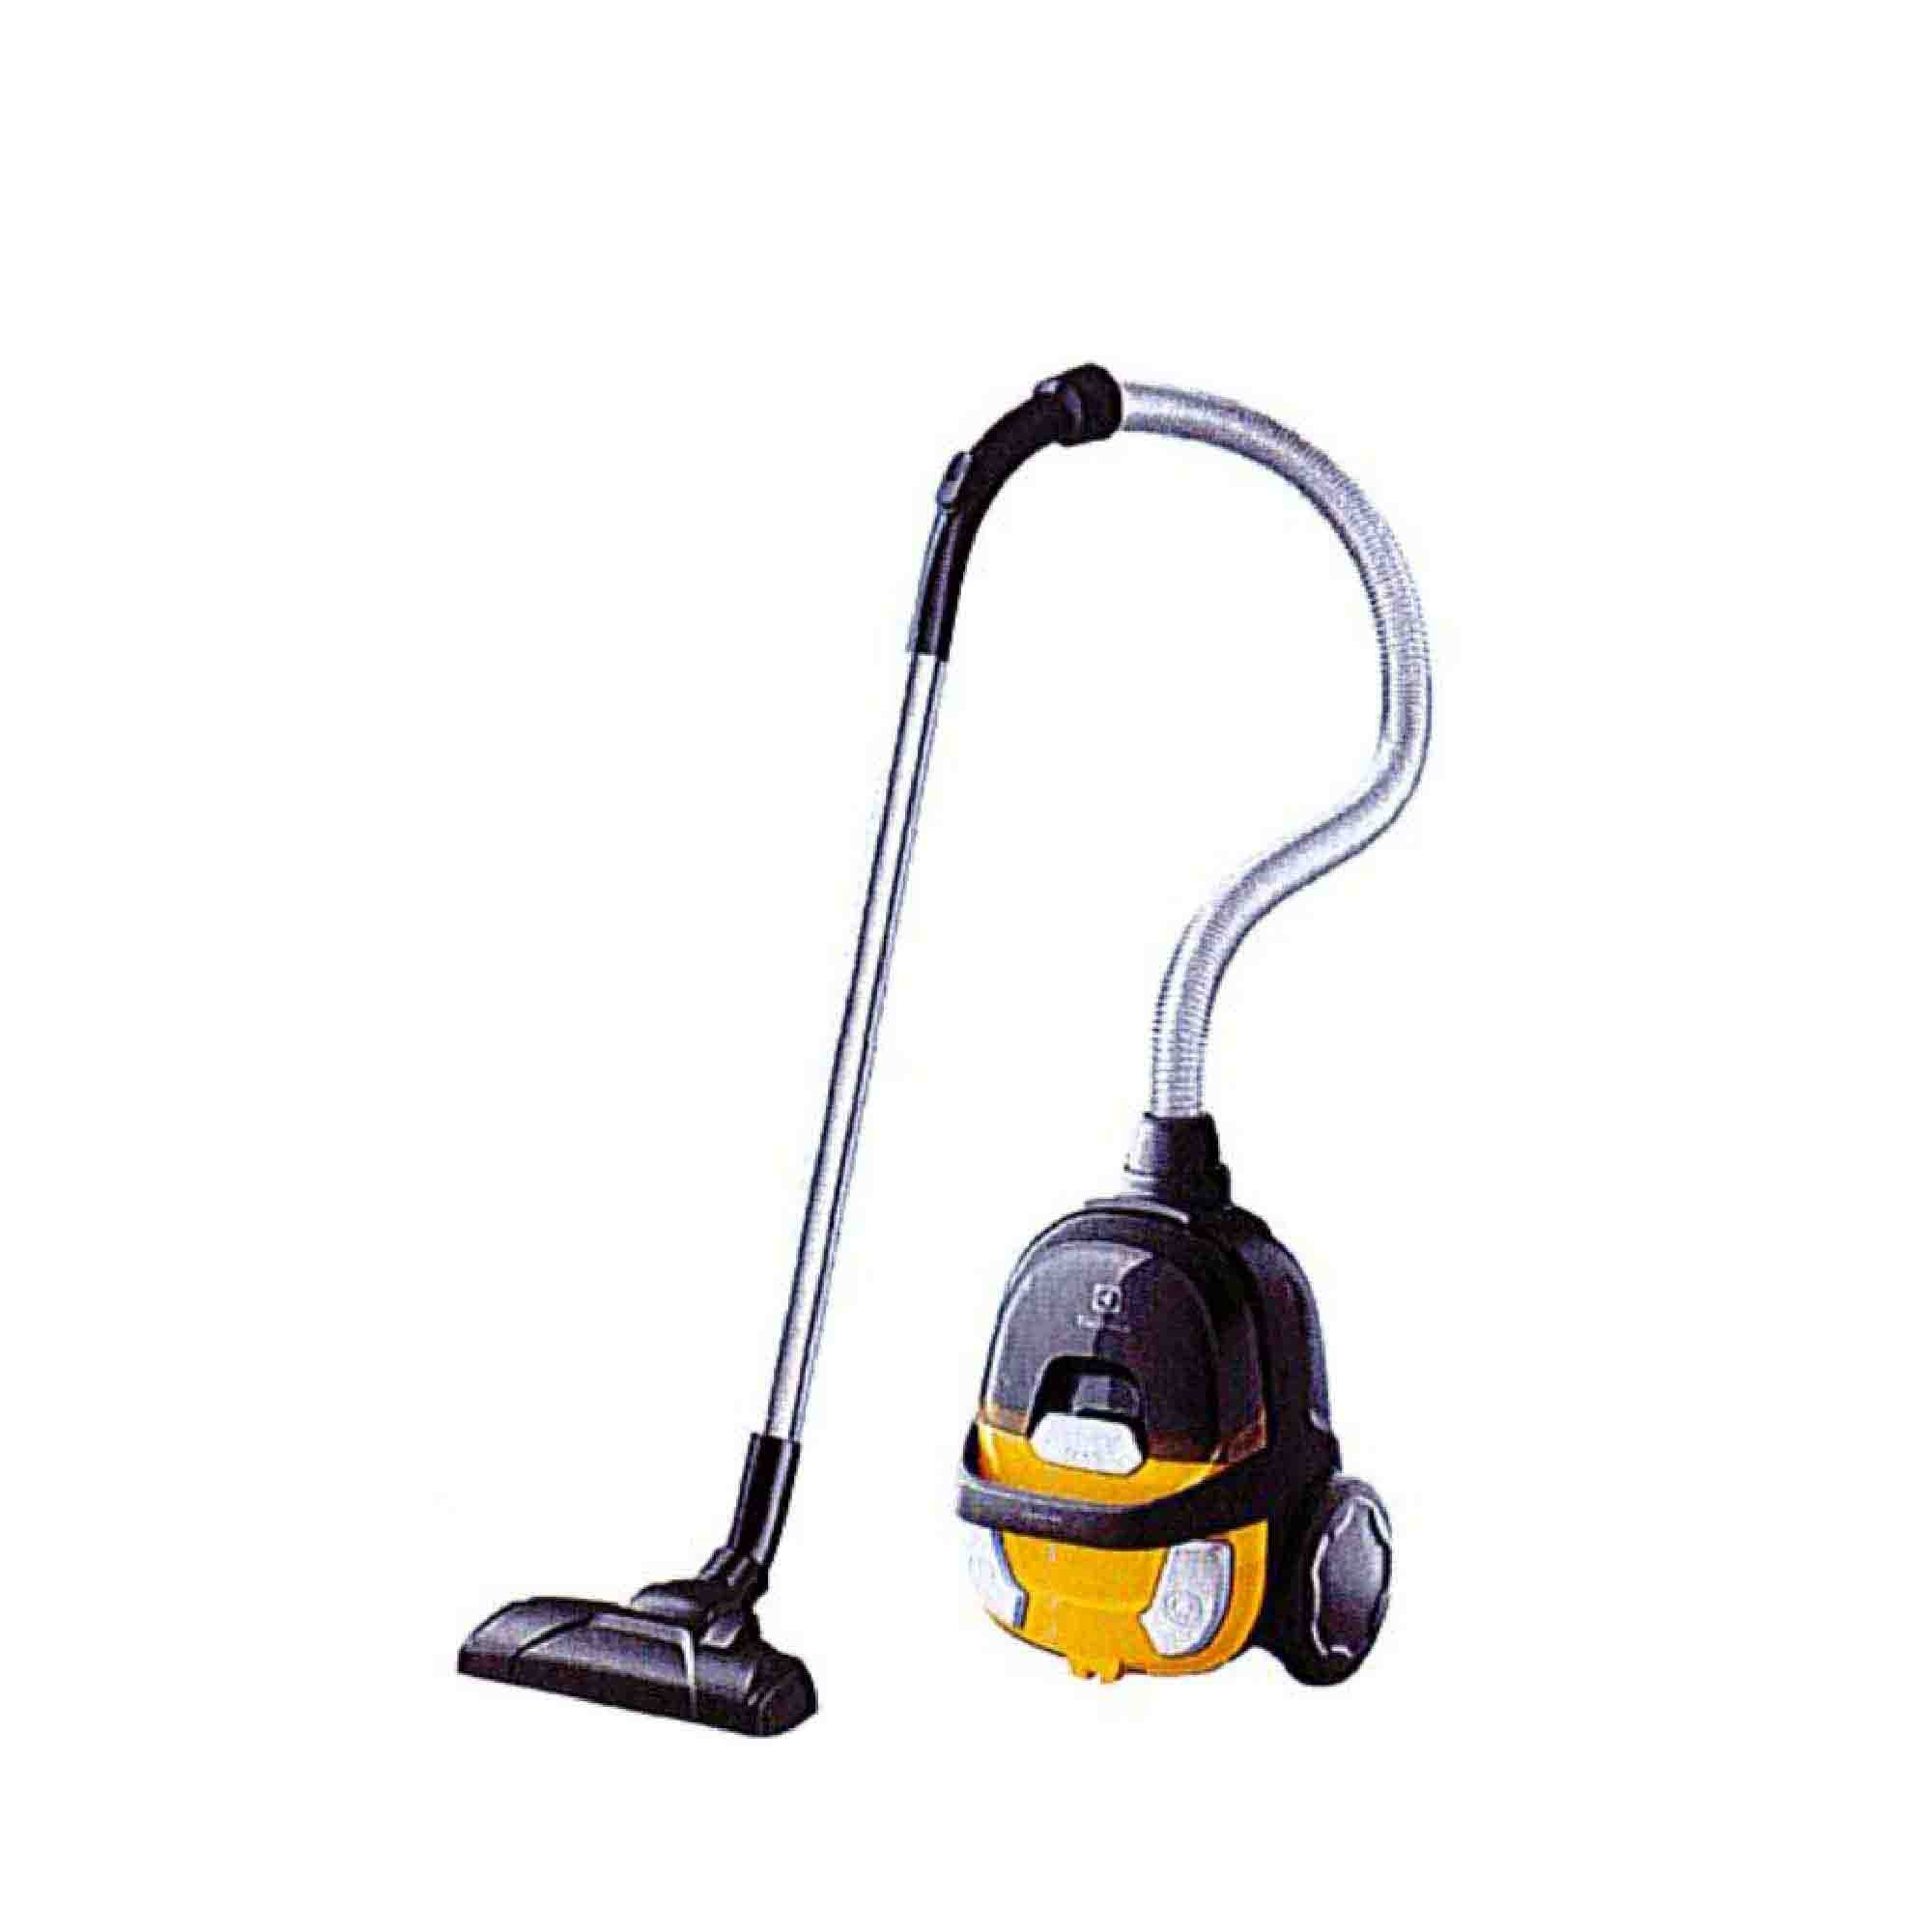 Electrolux Vacuum Cleaner Z1230 1500W Bagless DustPro Nozzle